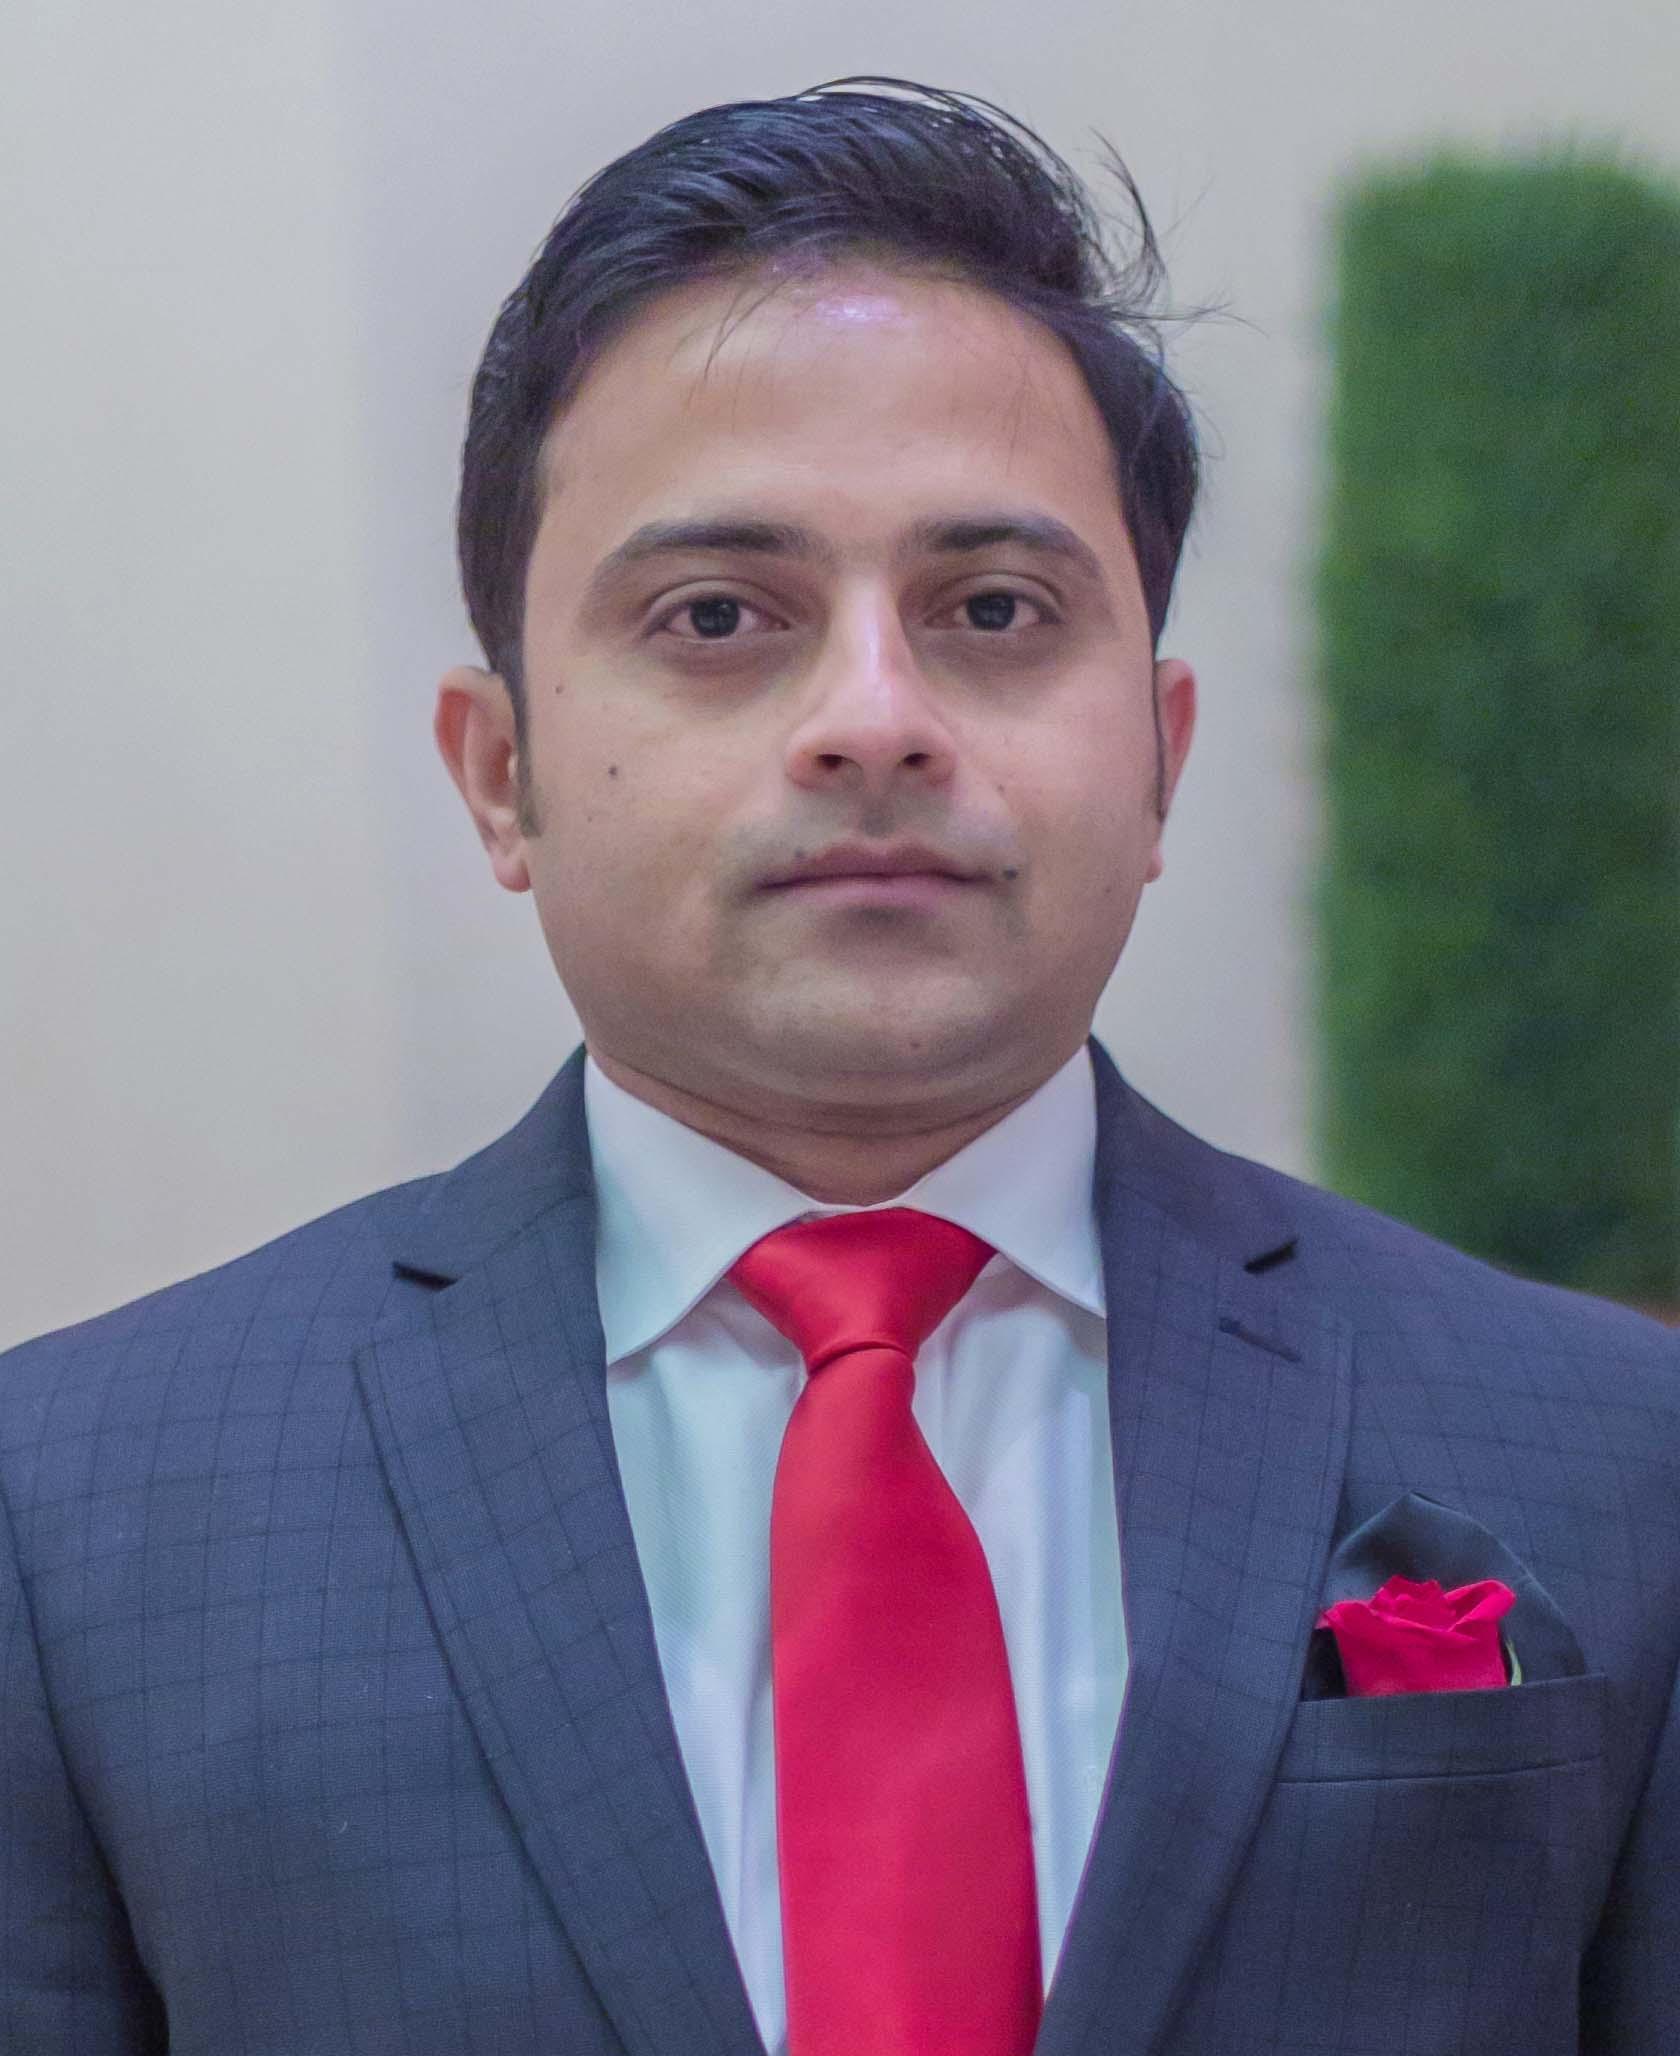 Mohamad Faroqui